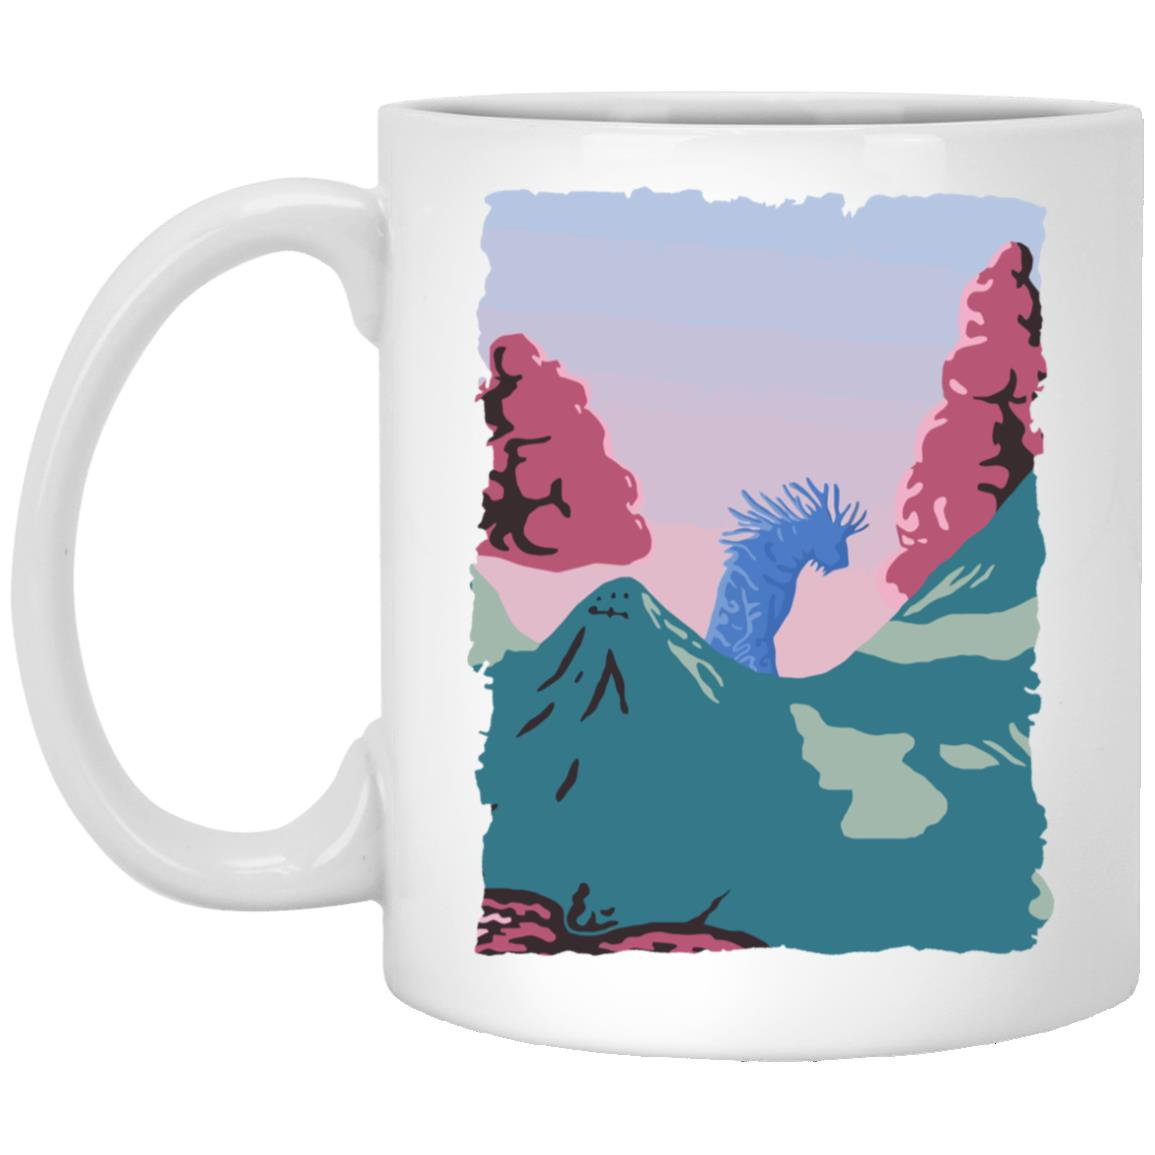 Princess Mononoke – Shishigami Night time Mug